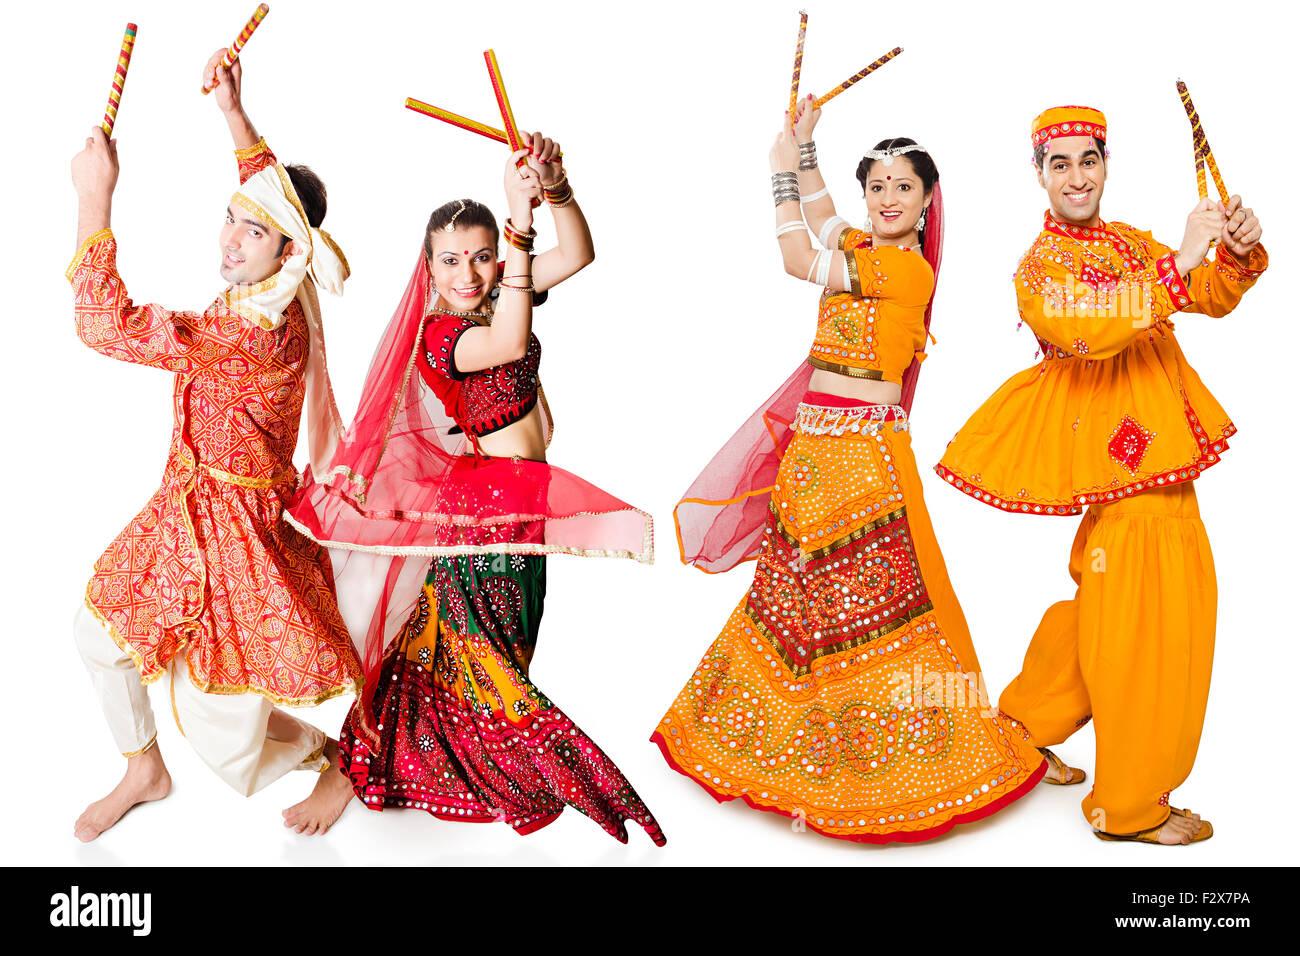 4 Indian Rajasthani And Gujrati Couple Navaratri Dandiya Dance Stock Photo 87858018 Alamy